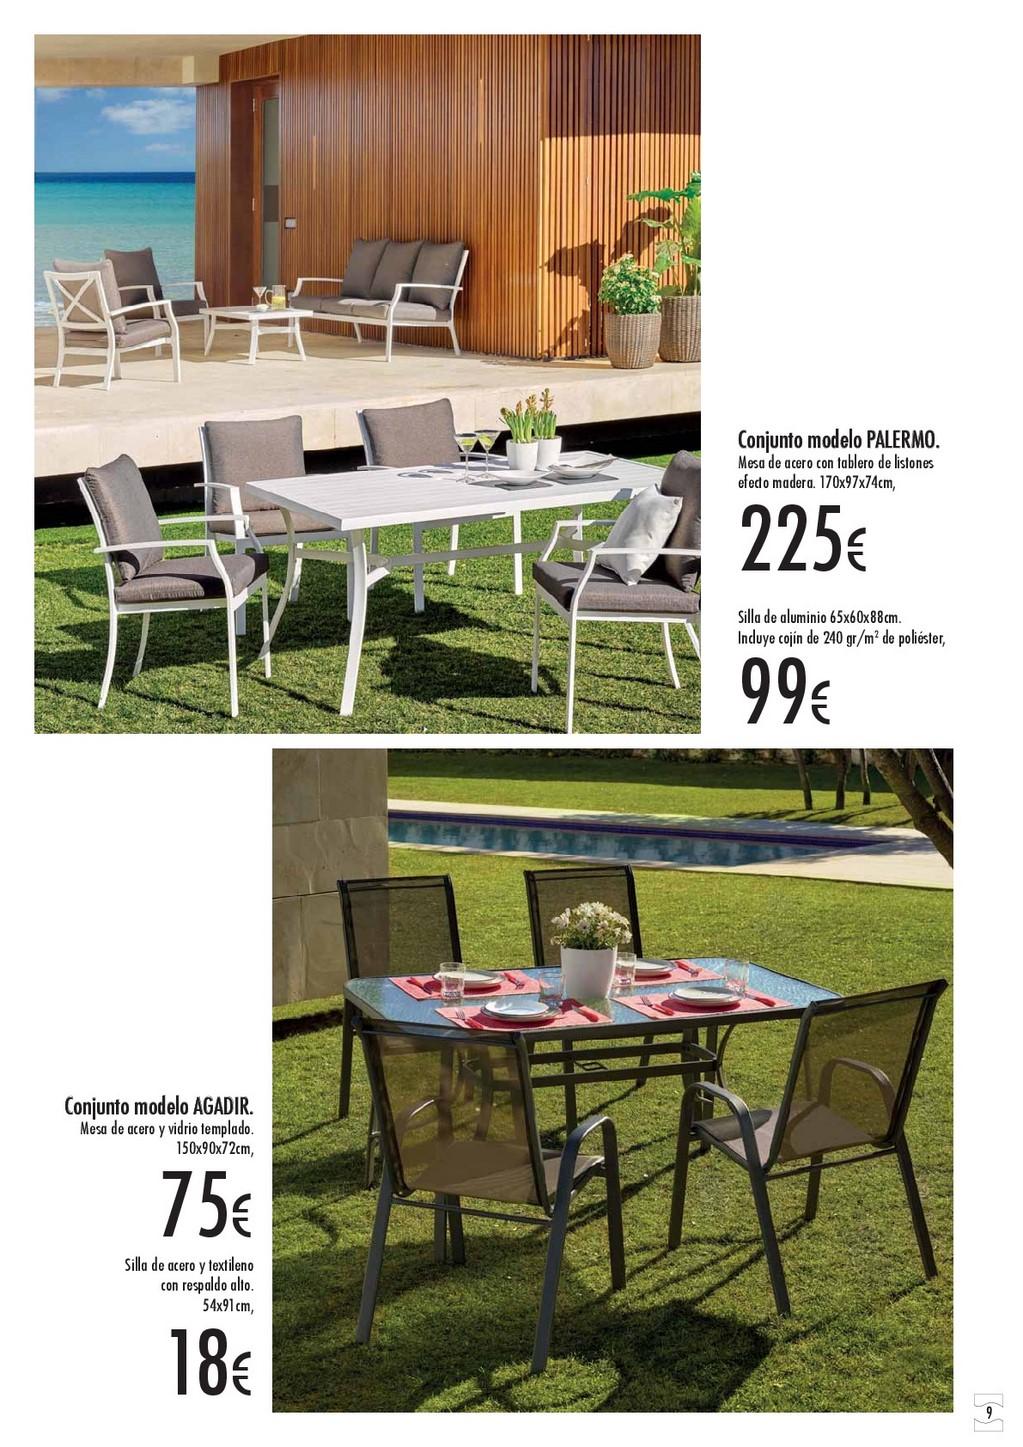 Terraza y jardin hipercor 20169 - Carrefour terraza y jardin ...